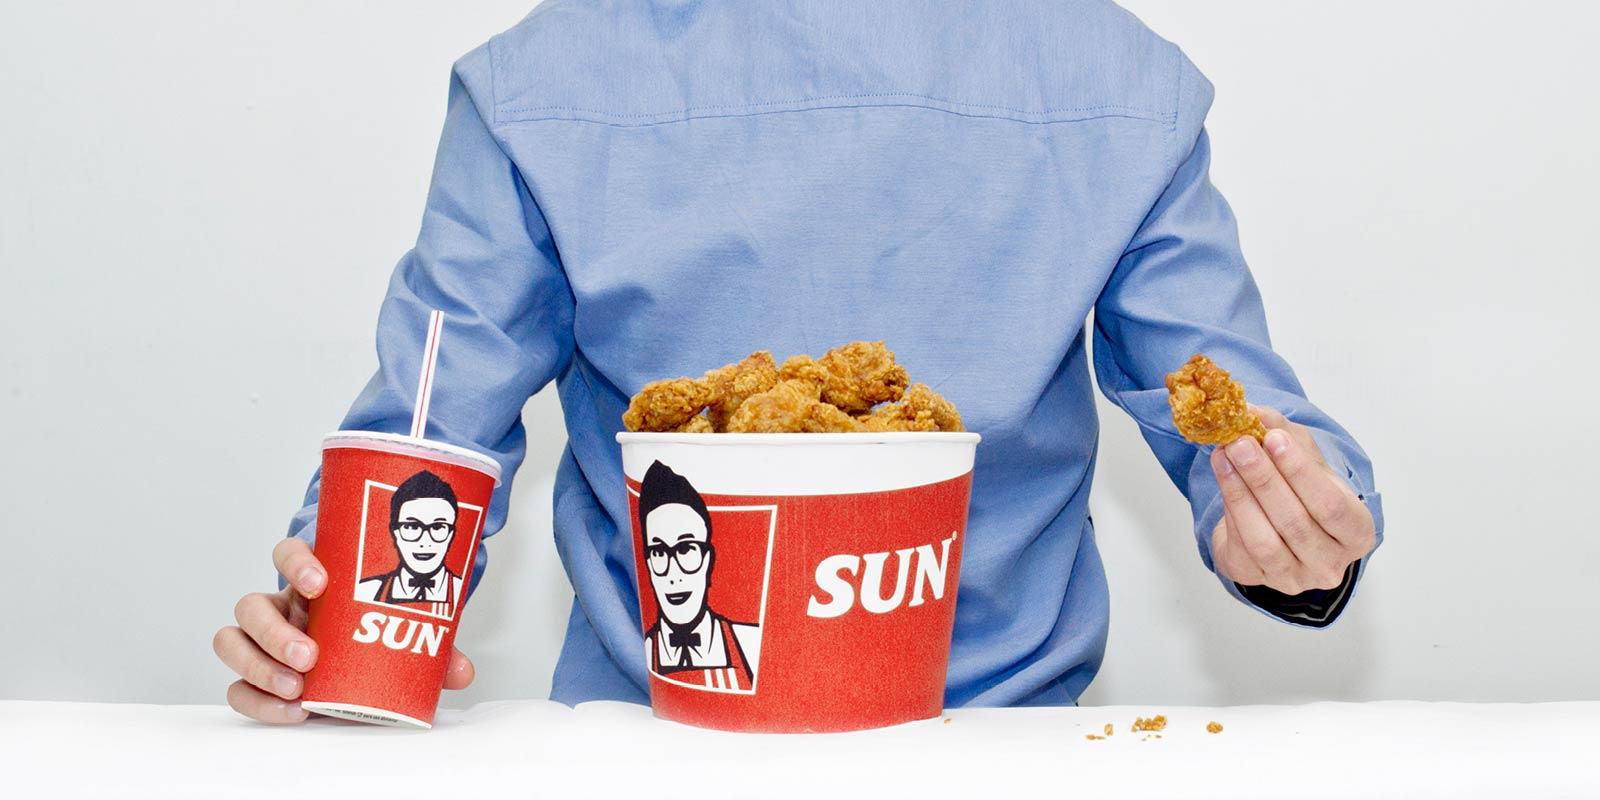 I ate KFC and paid the double fee - Haarlem (2013)